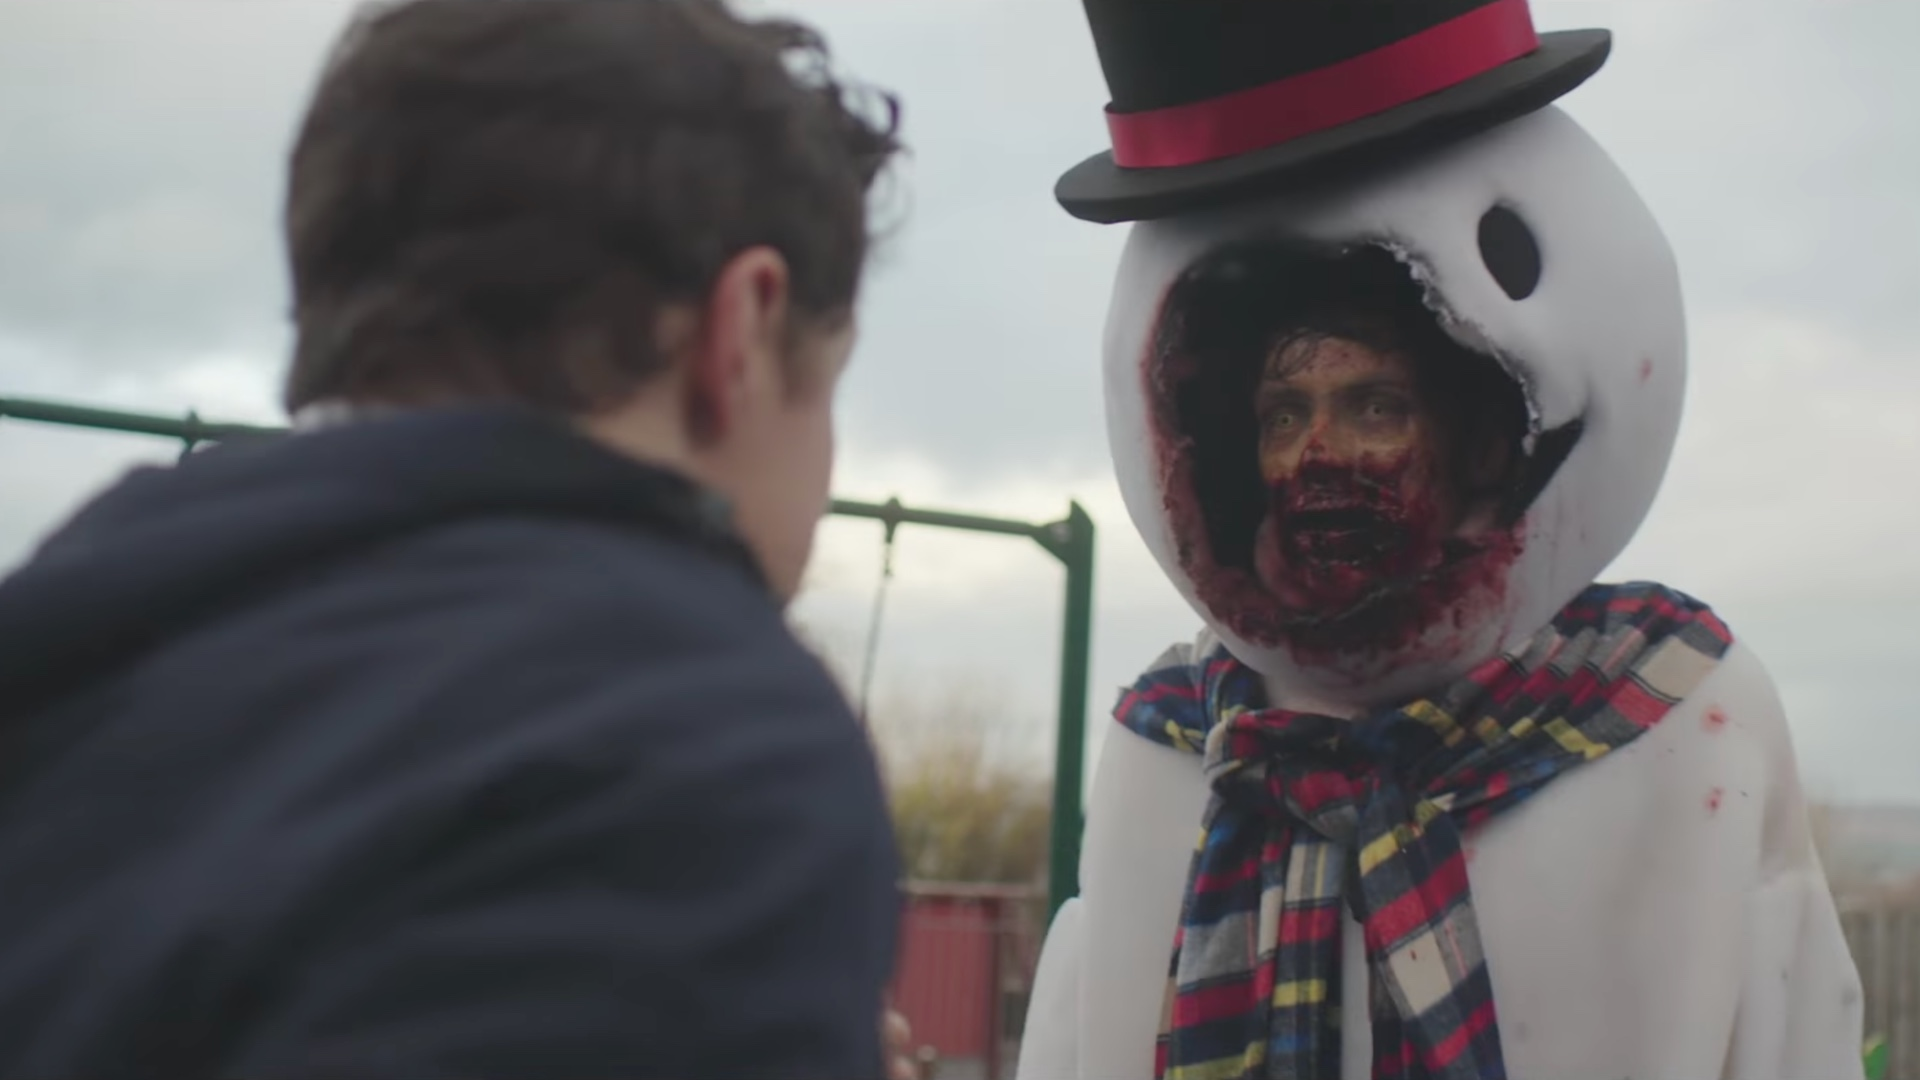 Christmas Zombie Wallpaper.Amusing Trailer For The Zombie Christmas Musical Film Anna